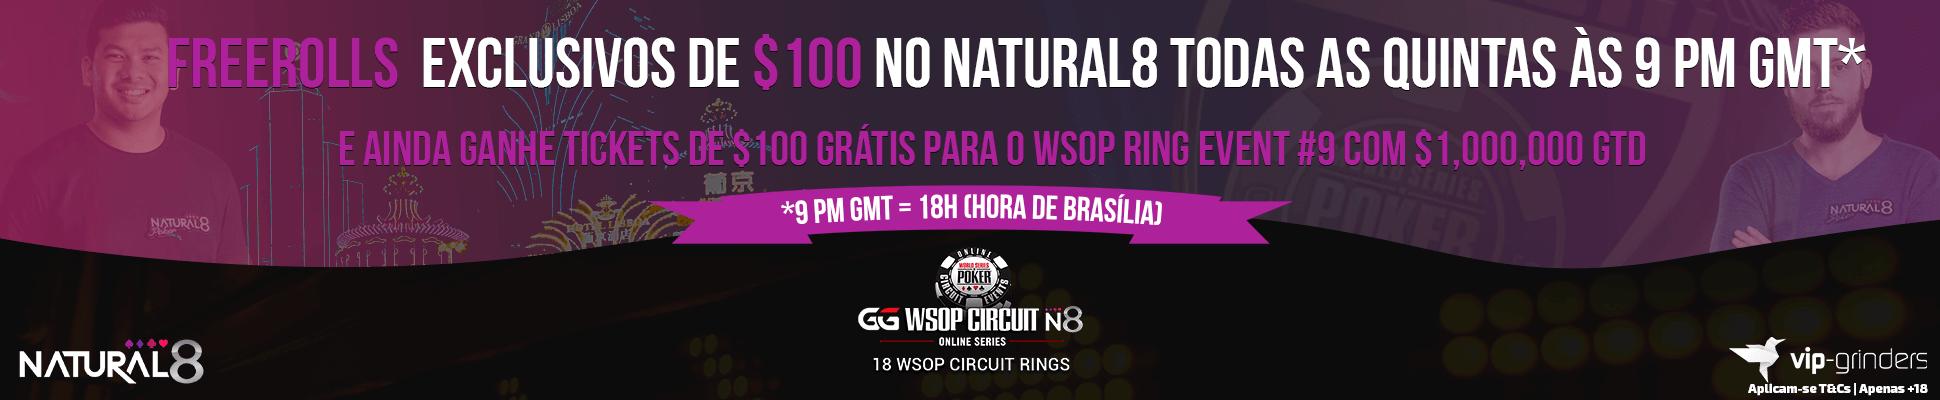 natural8-wsop-1940x400-3-2